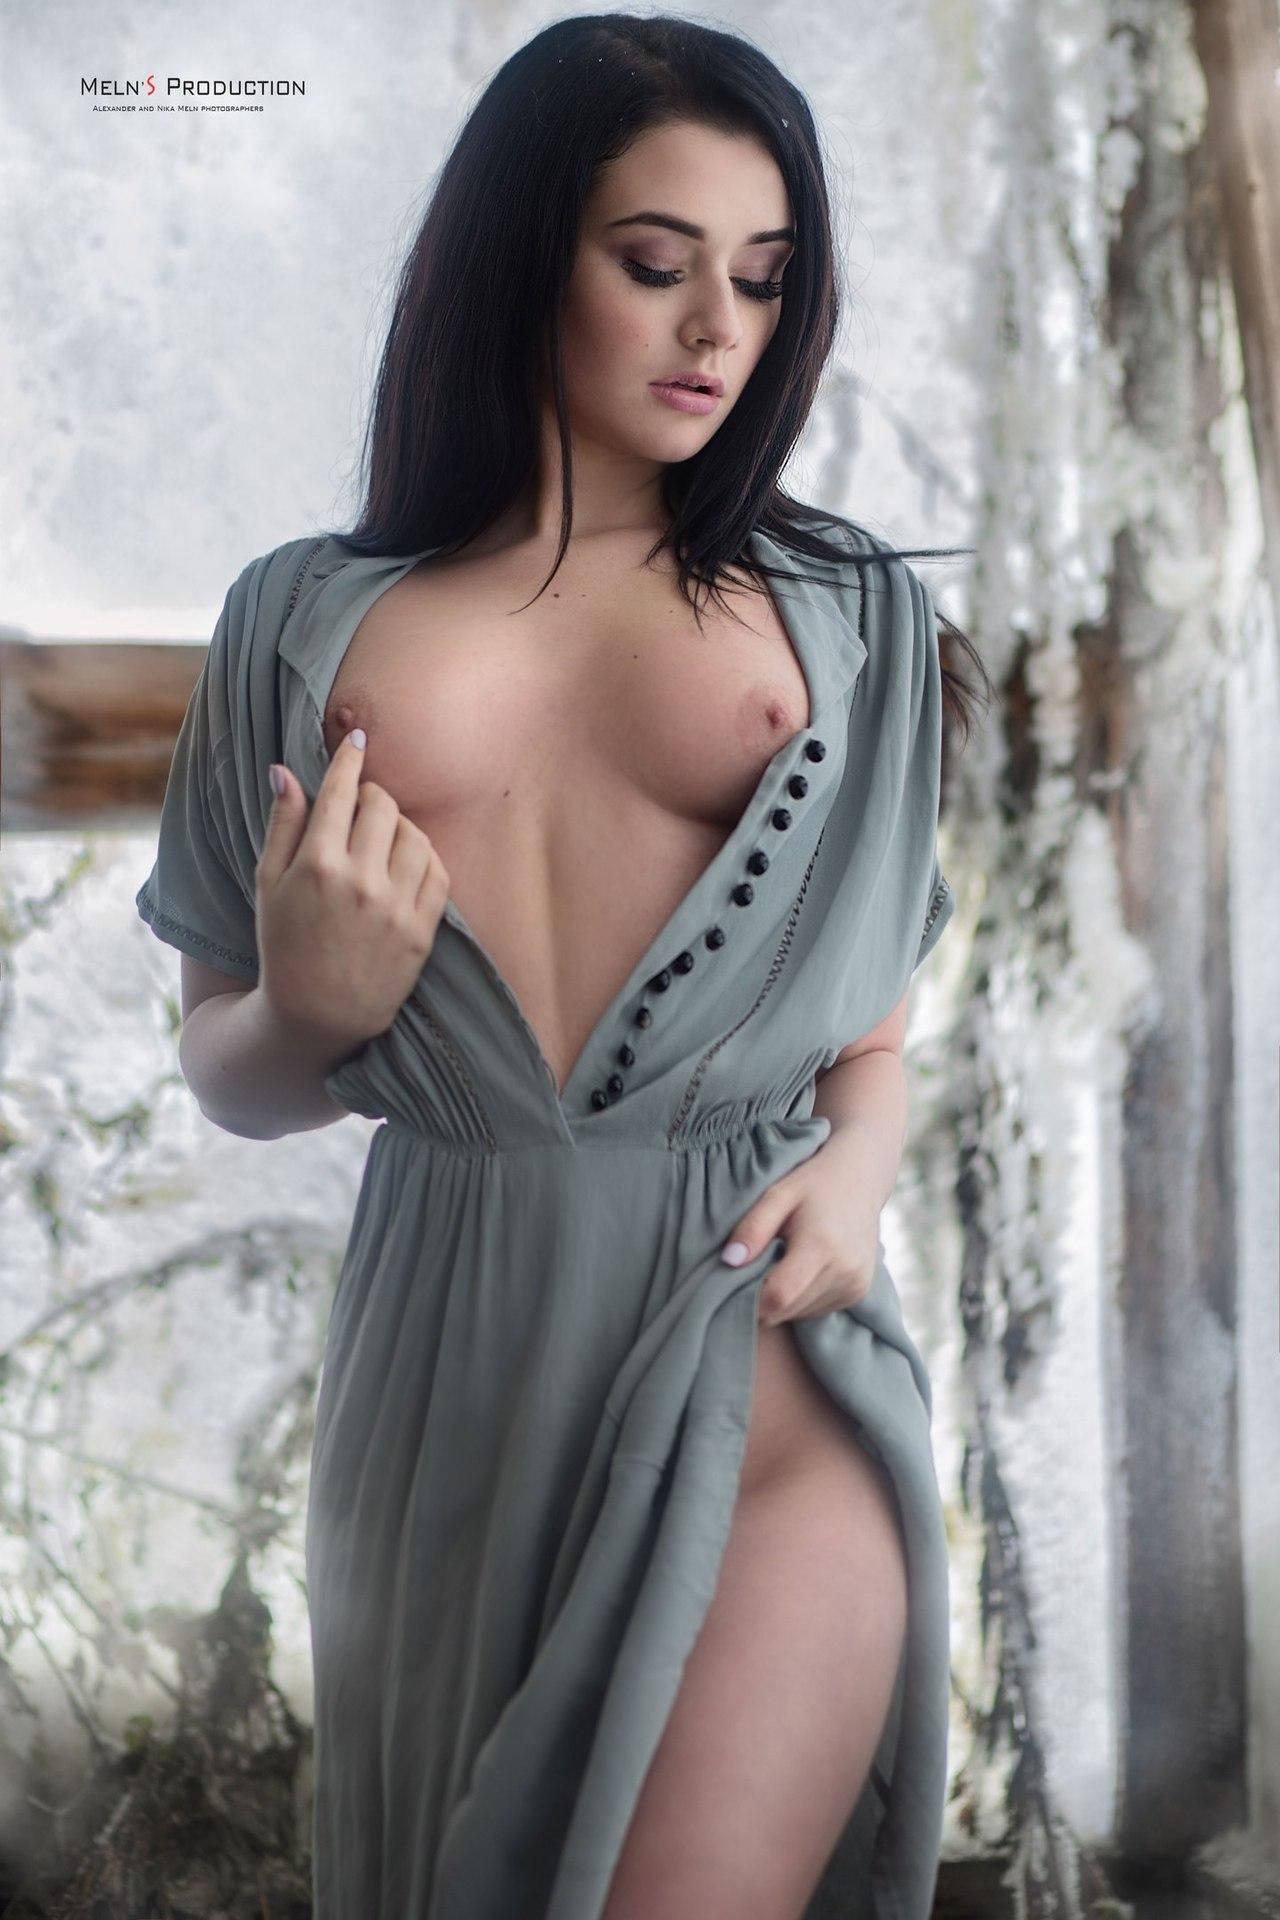 Darya Delishes